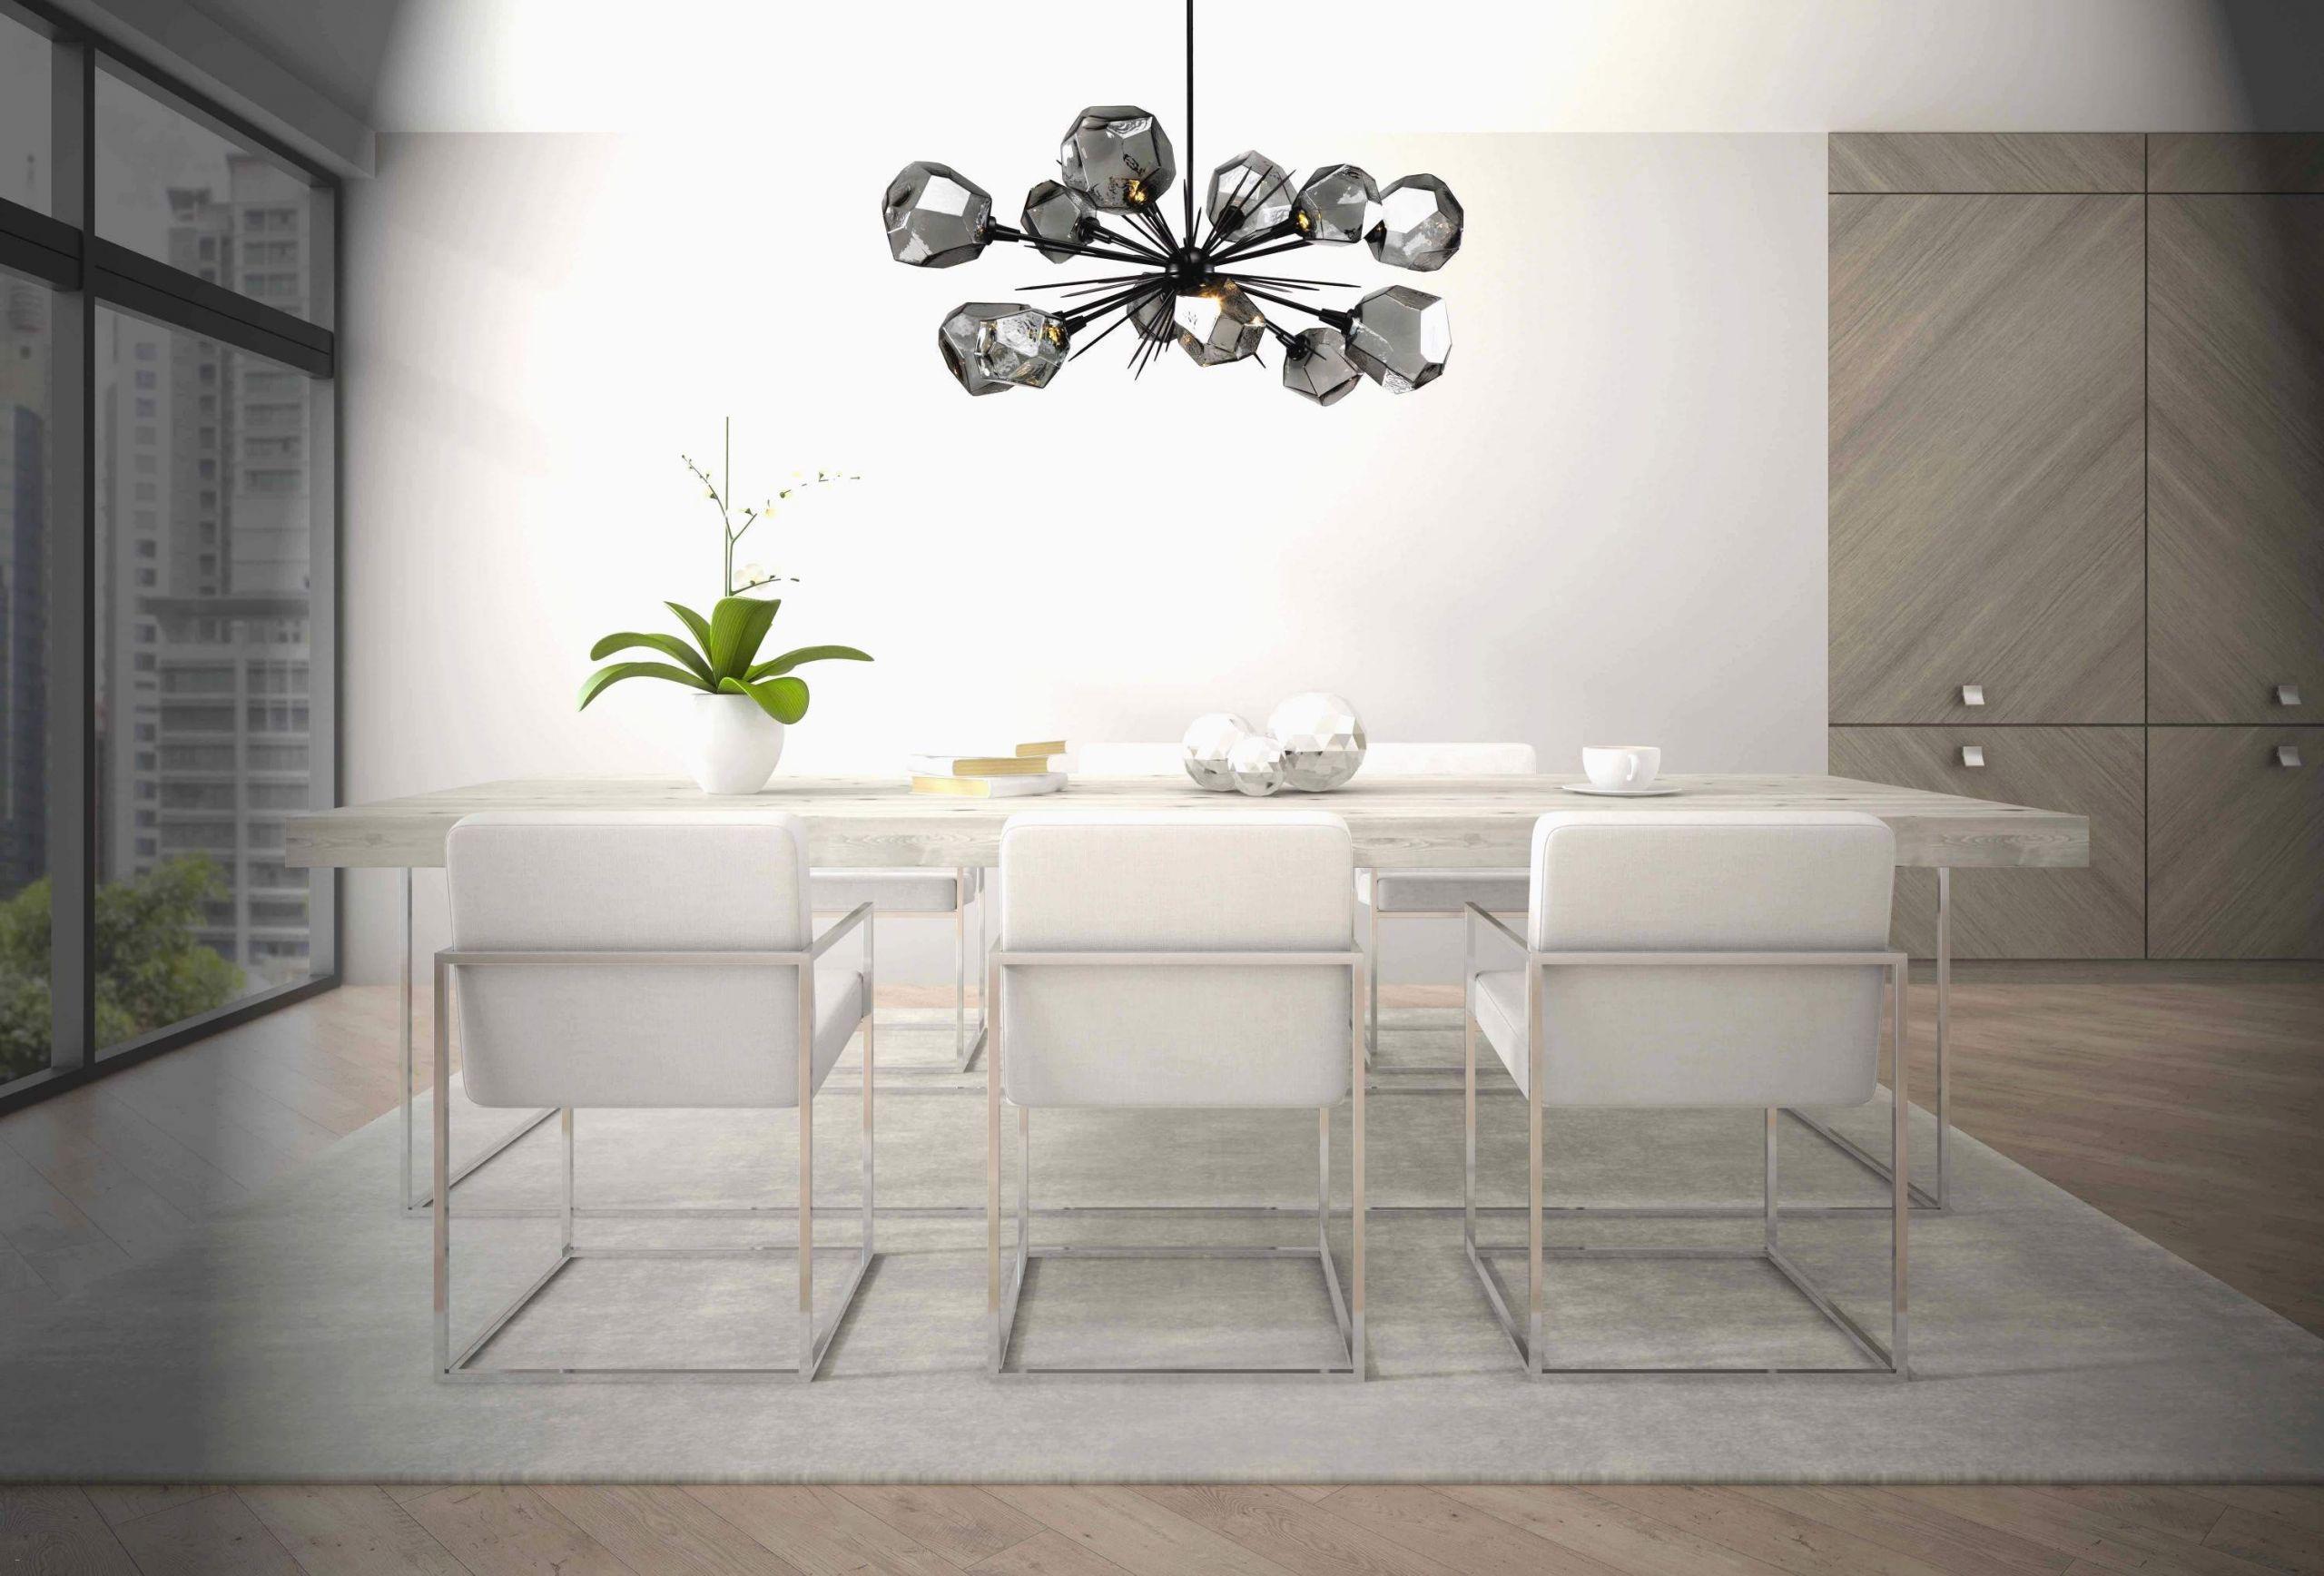 led lampen fur wohnzimmer genial inspirierend moderne lampen fur wohnzimmer of led lampen fur wohnzimmer